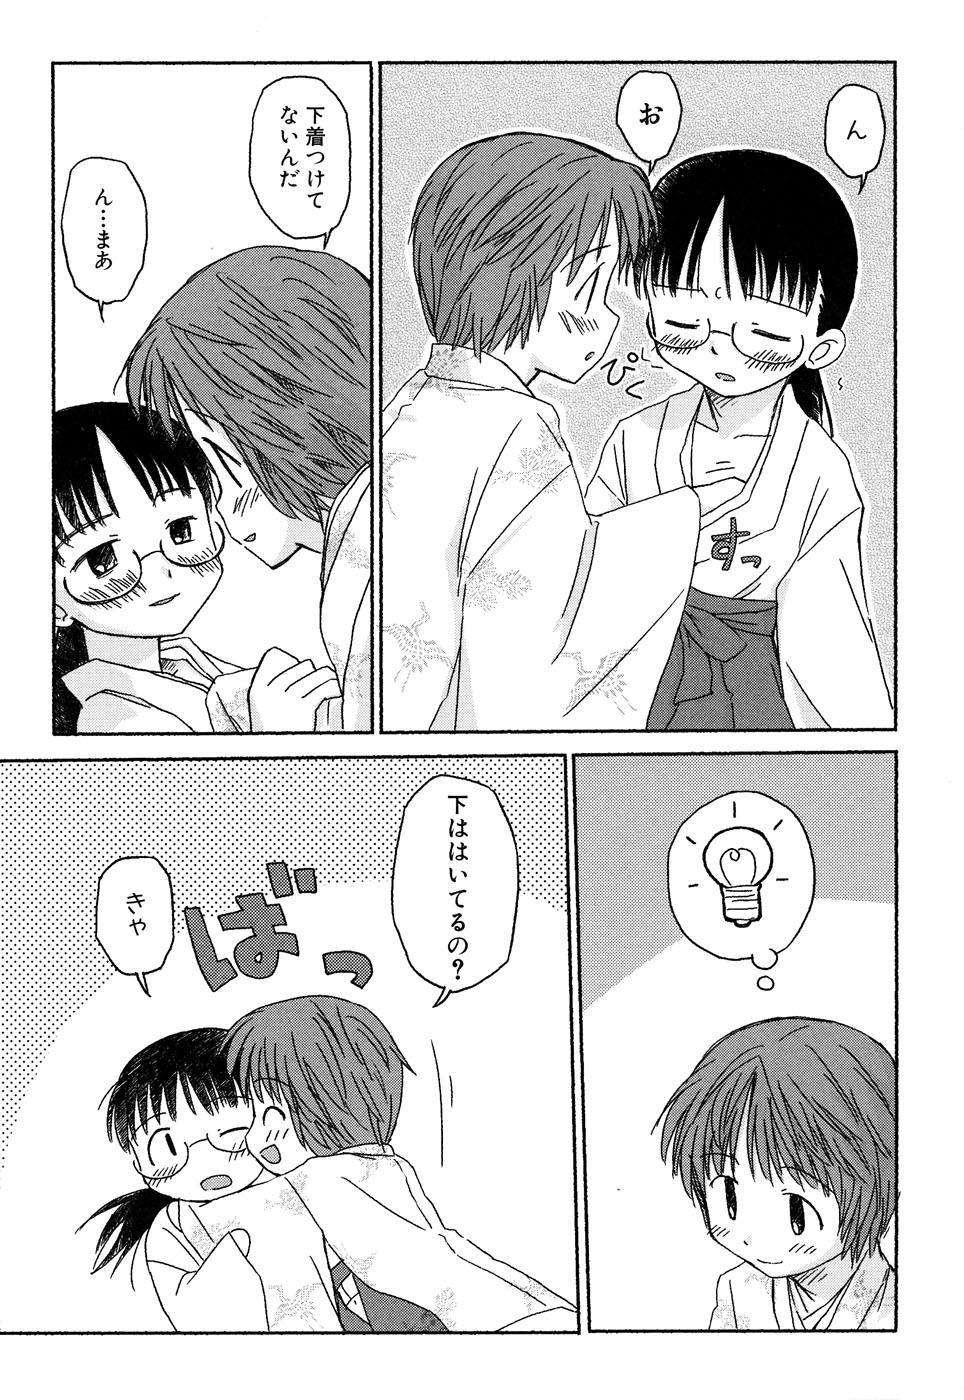 Fechikko VS Series ROUND.2 Miko San VS Maid San 63